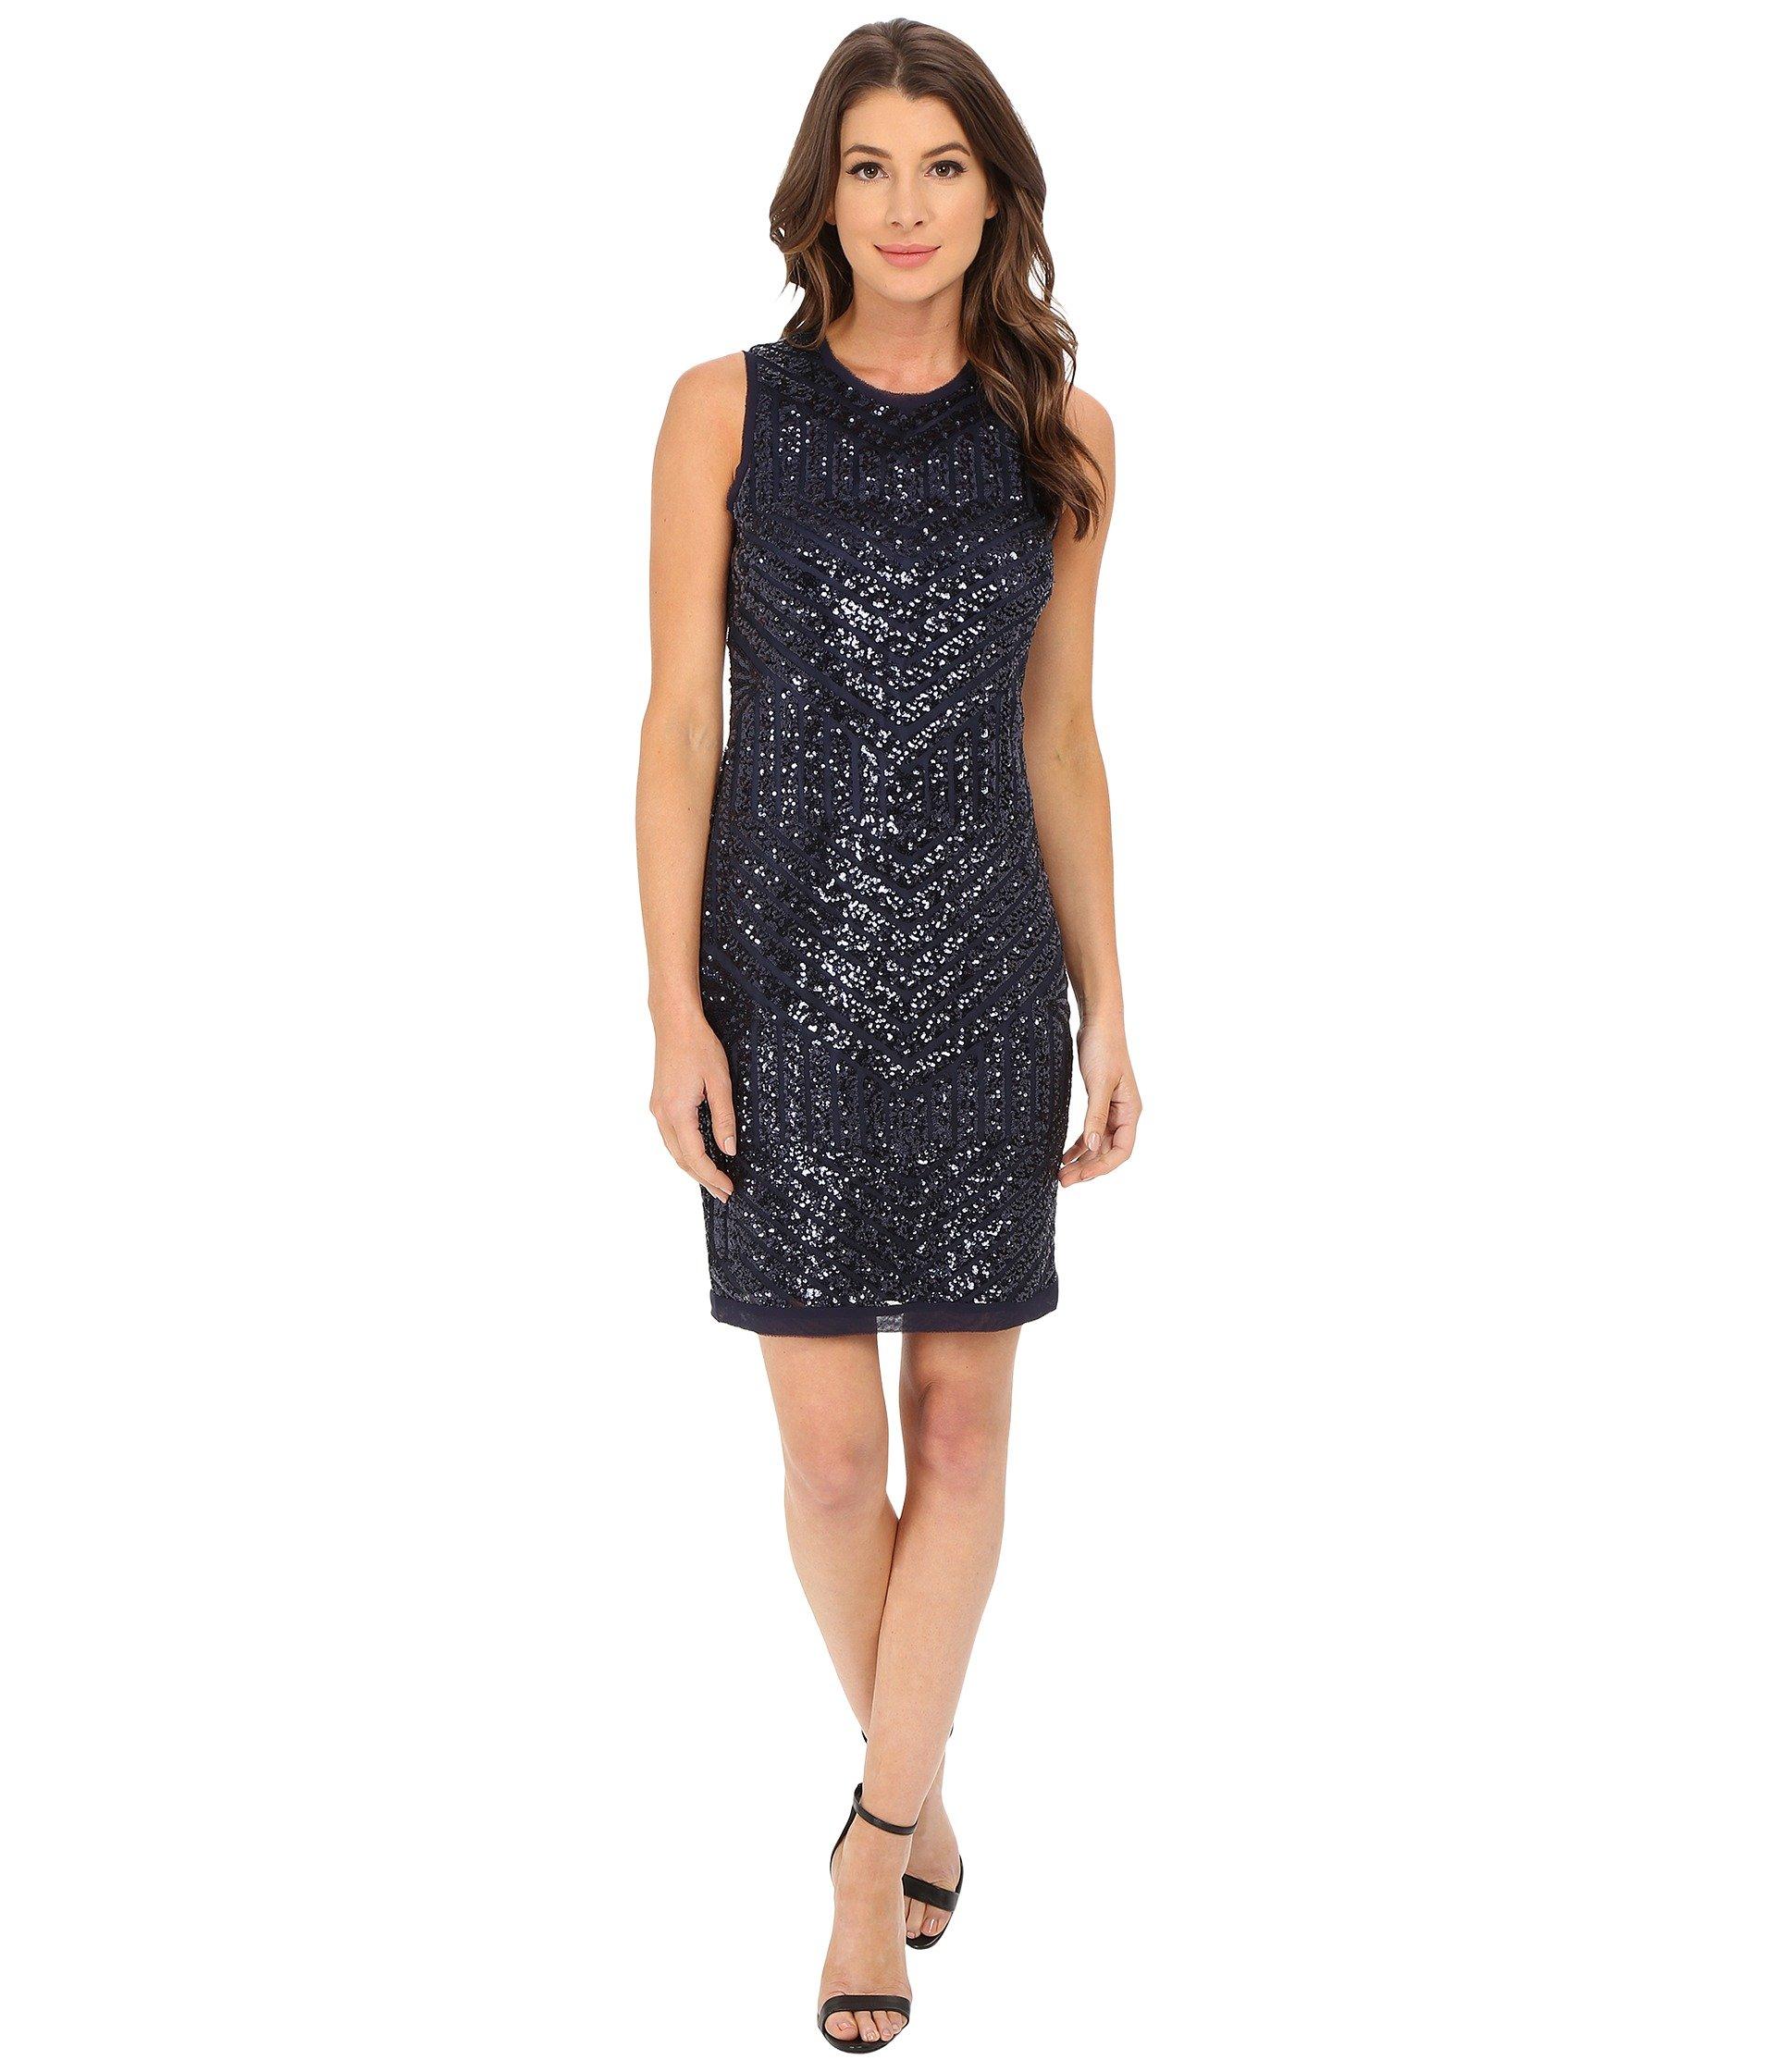 fca0b9448057 Vince Camuto Geo Sequin Sheath Dress in Blue - Lyst